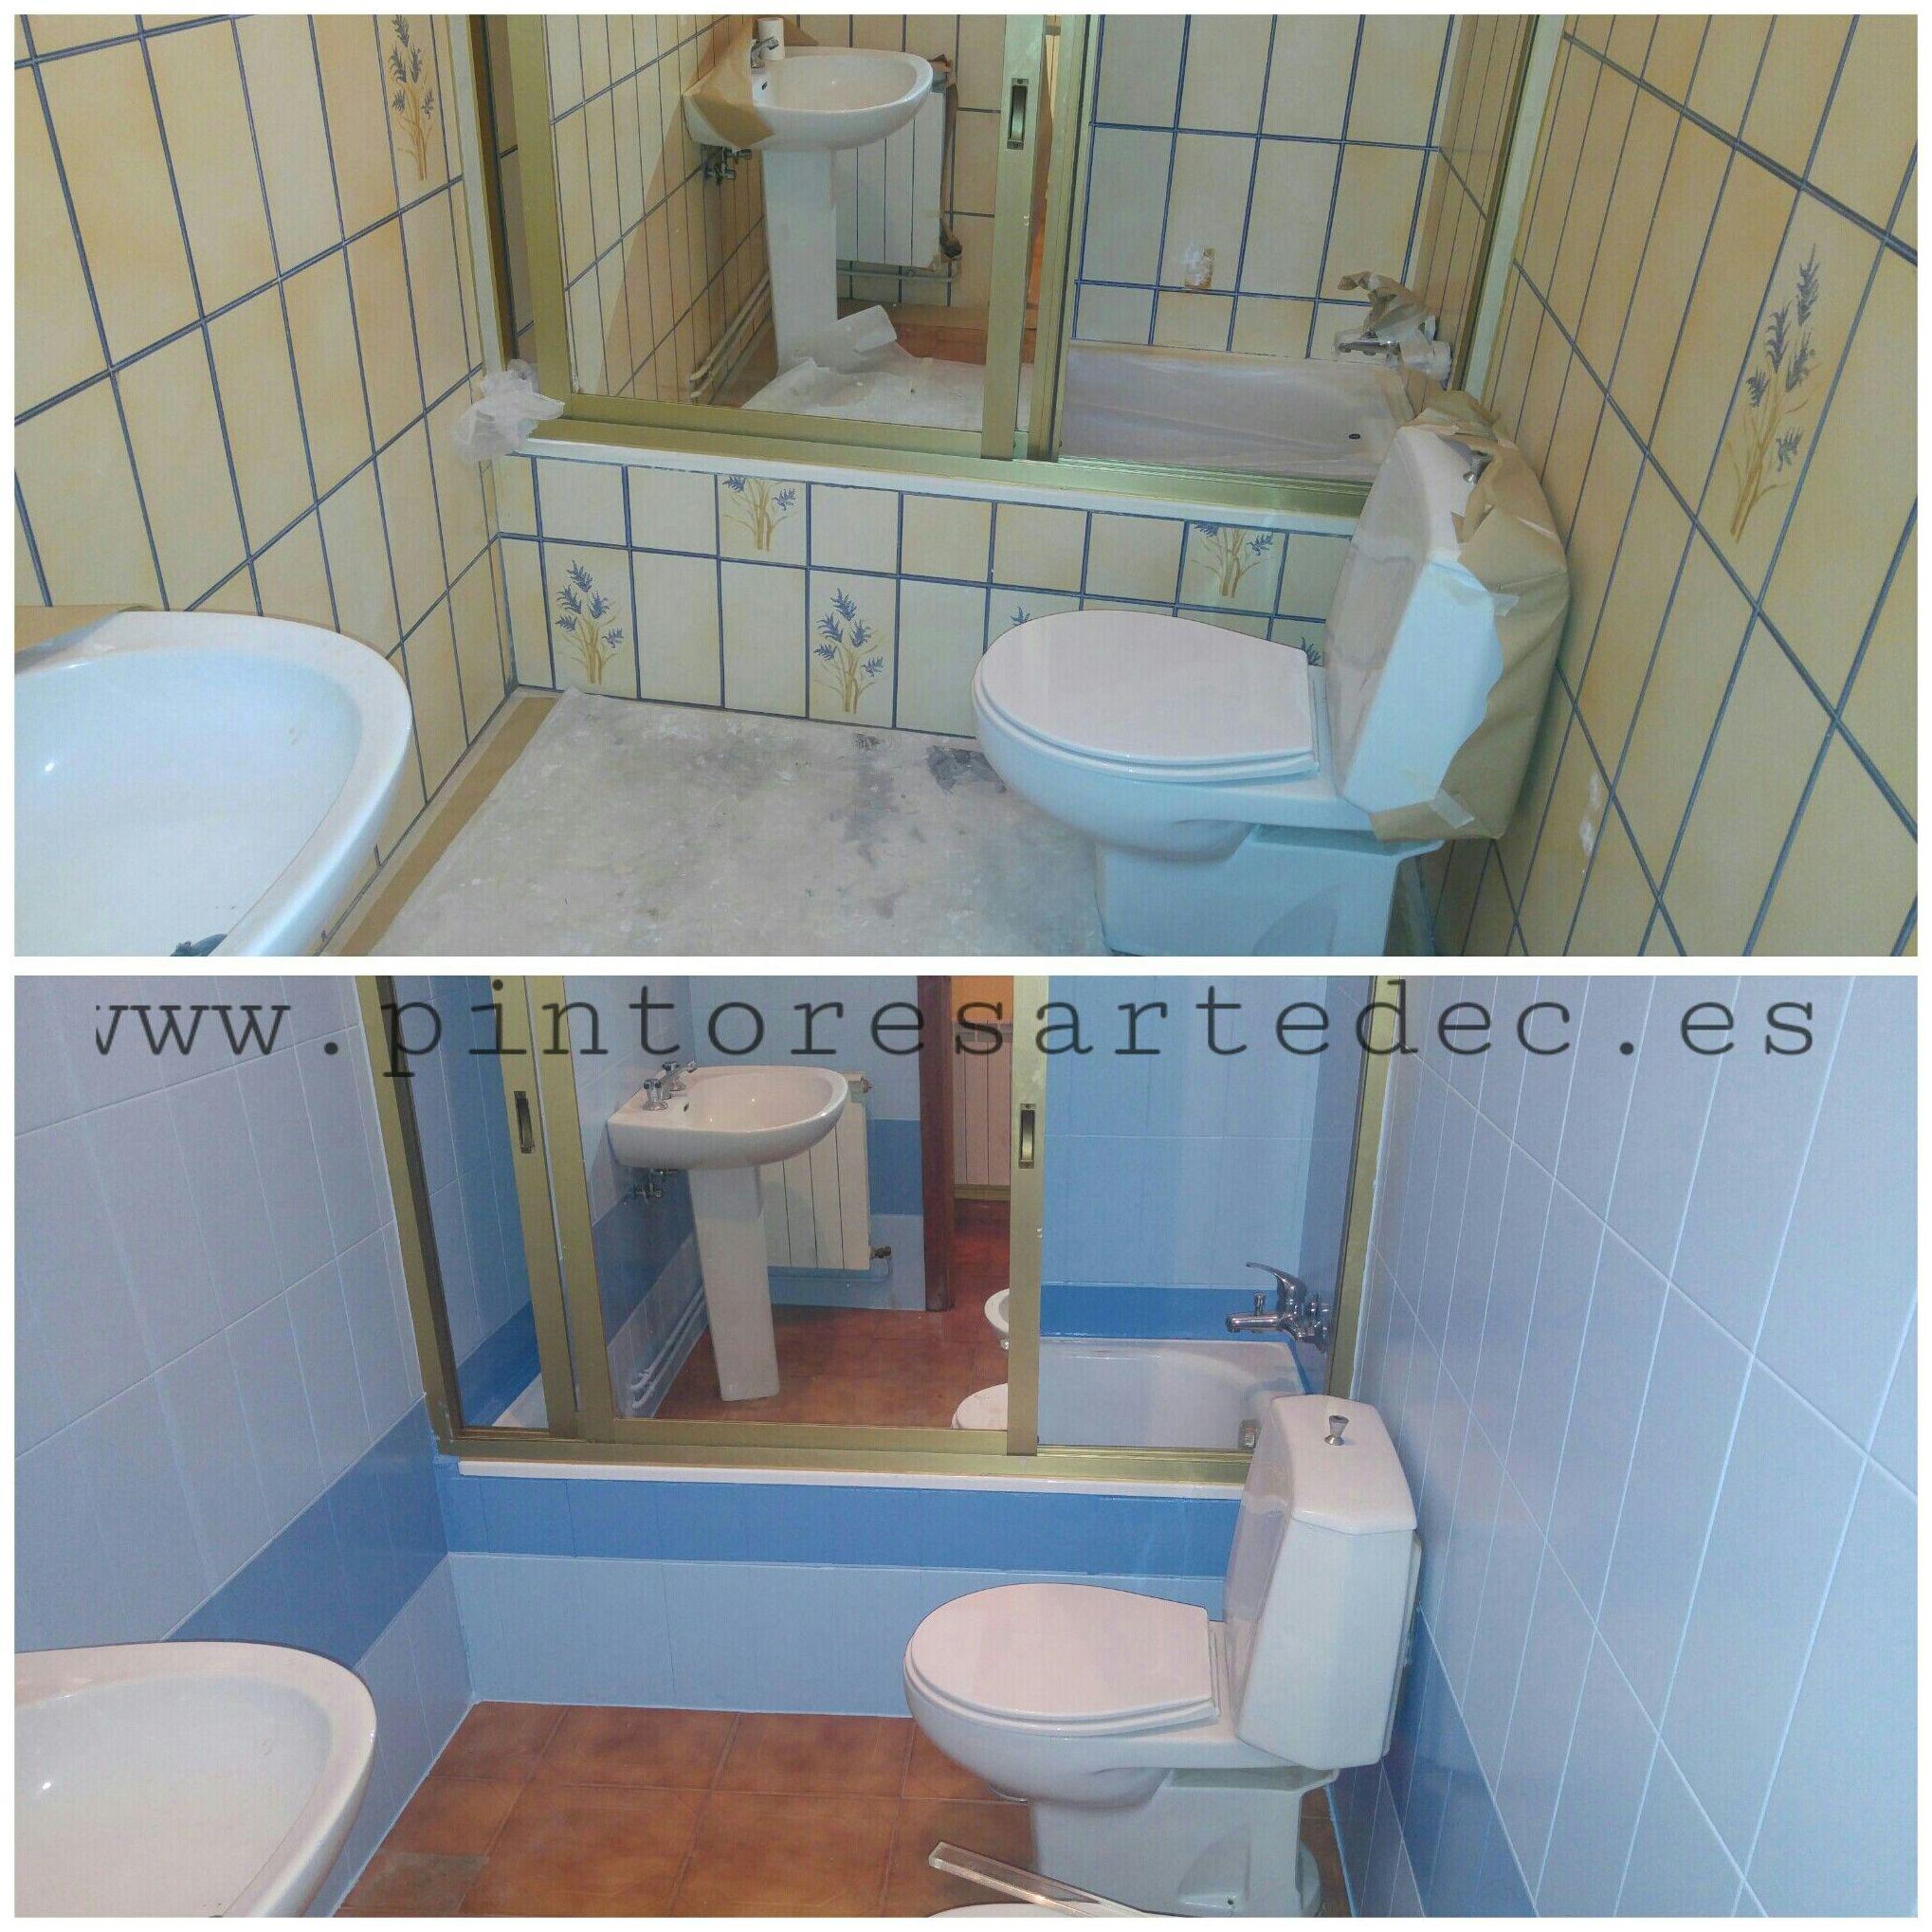 Pintura para azulejos servicios de pintores artedec - Pinturas para azulejos bano ...